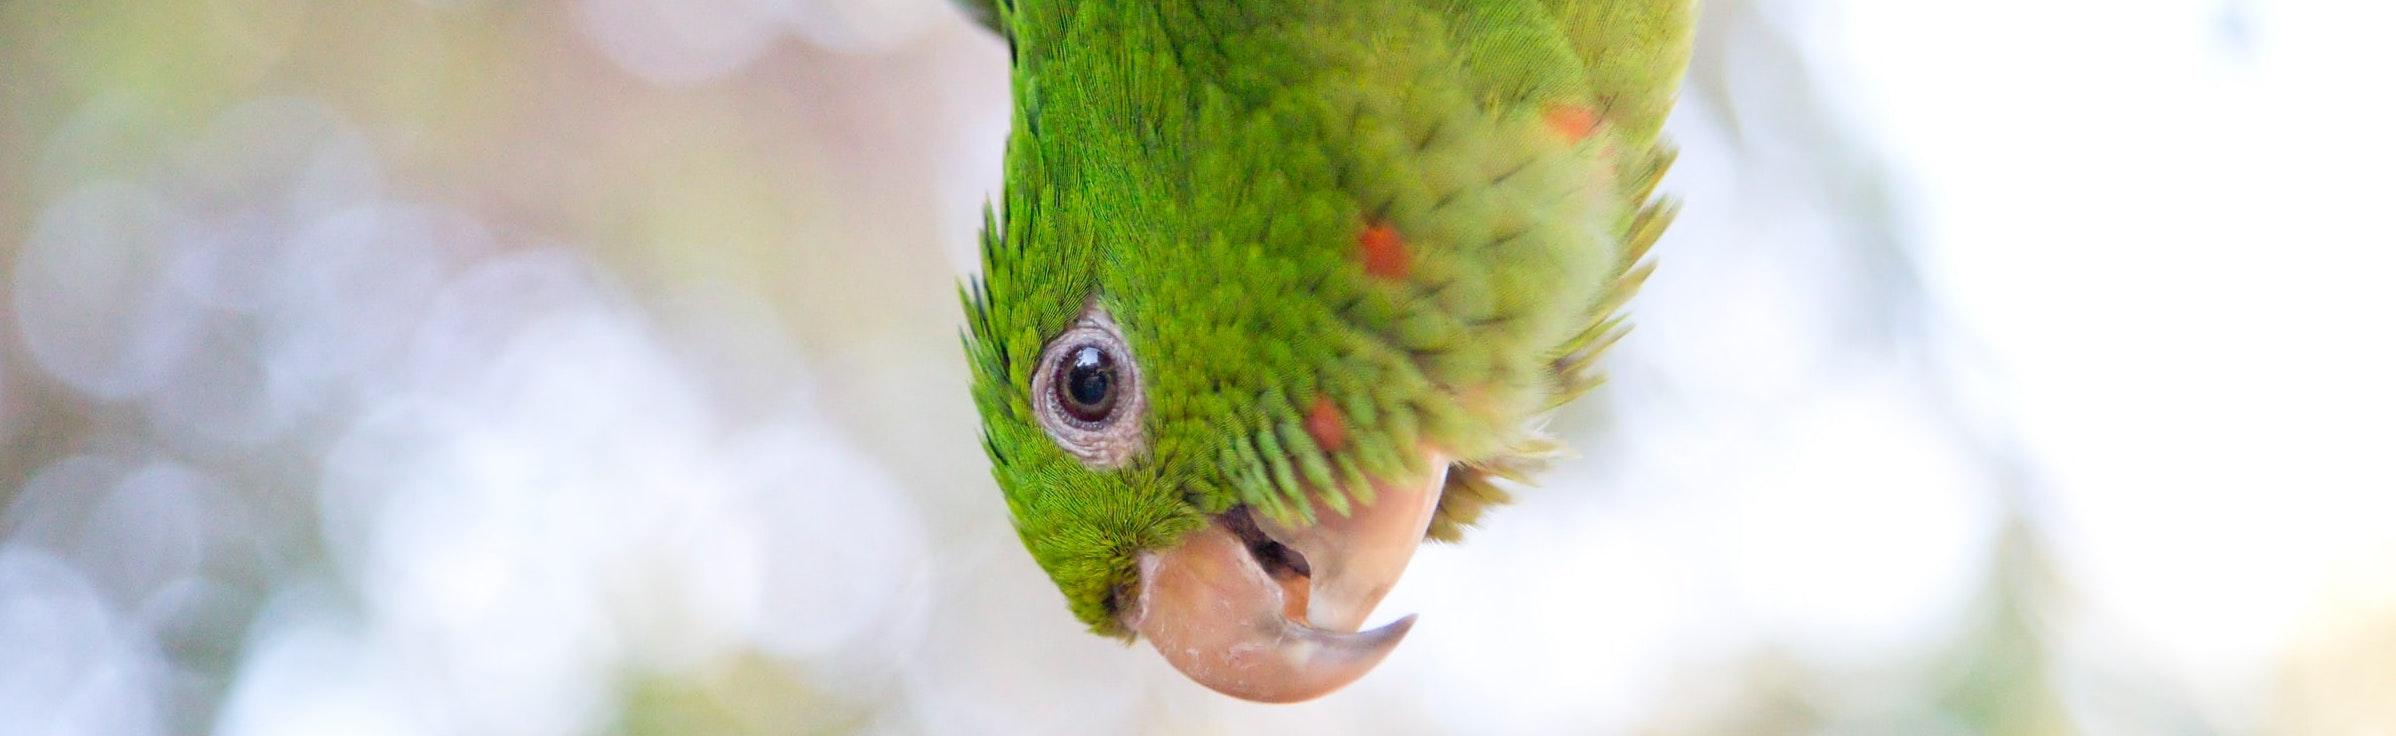 green conure head upside down